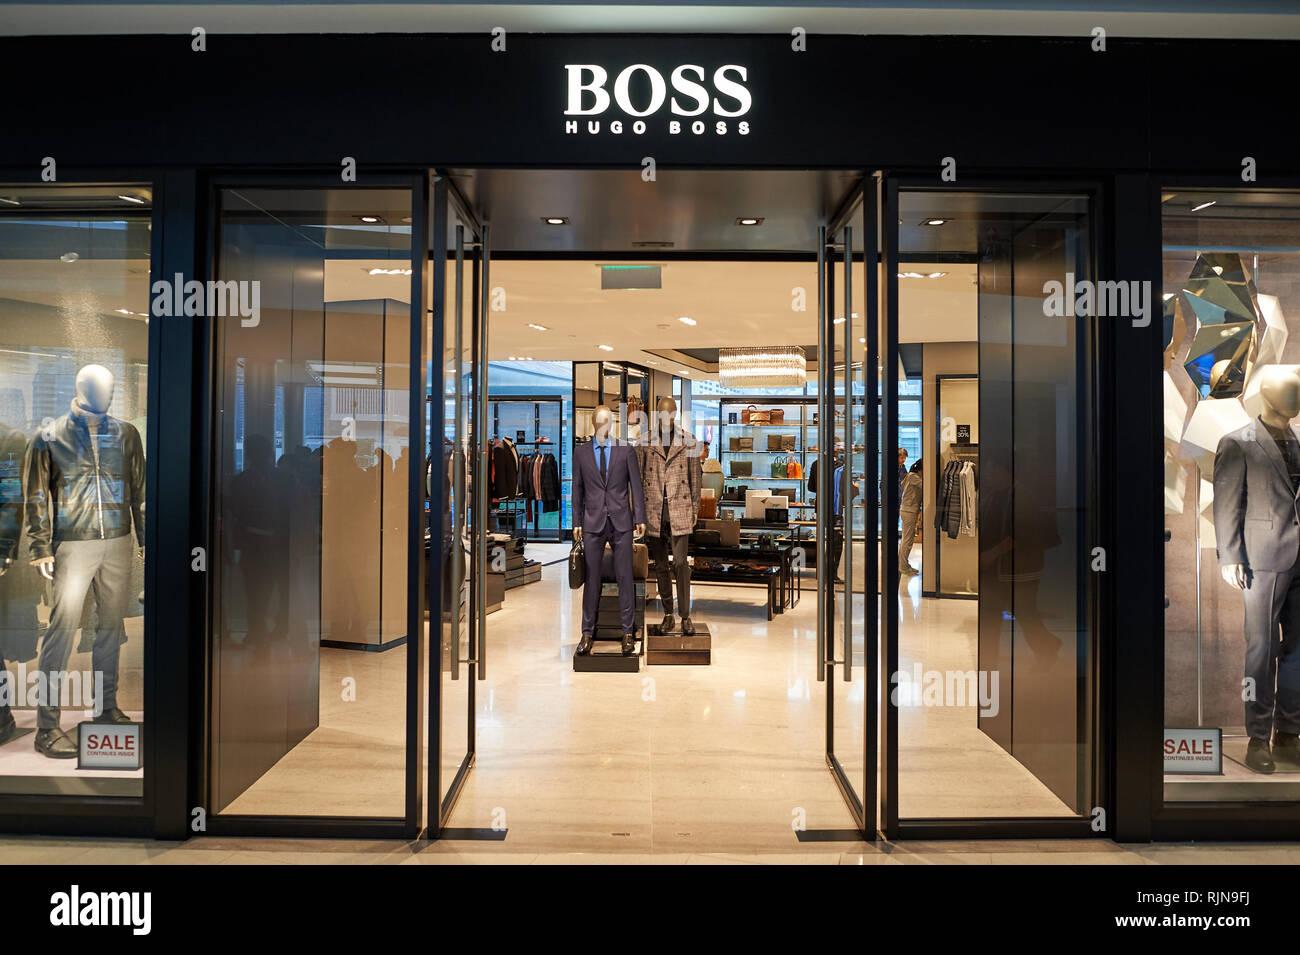 hugo boss near me